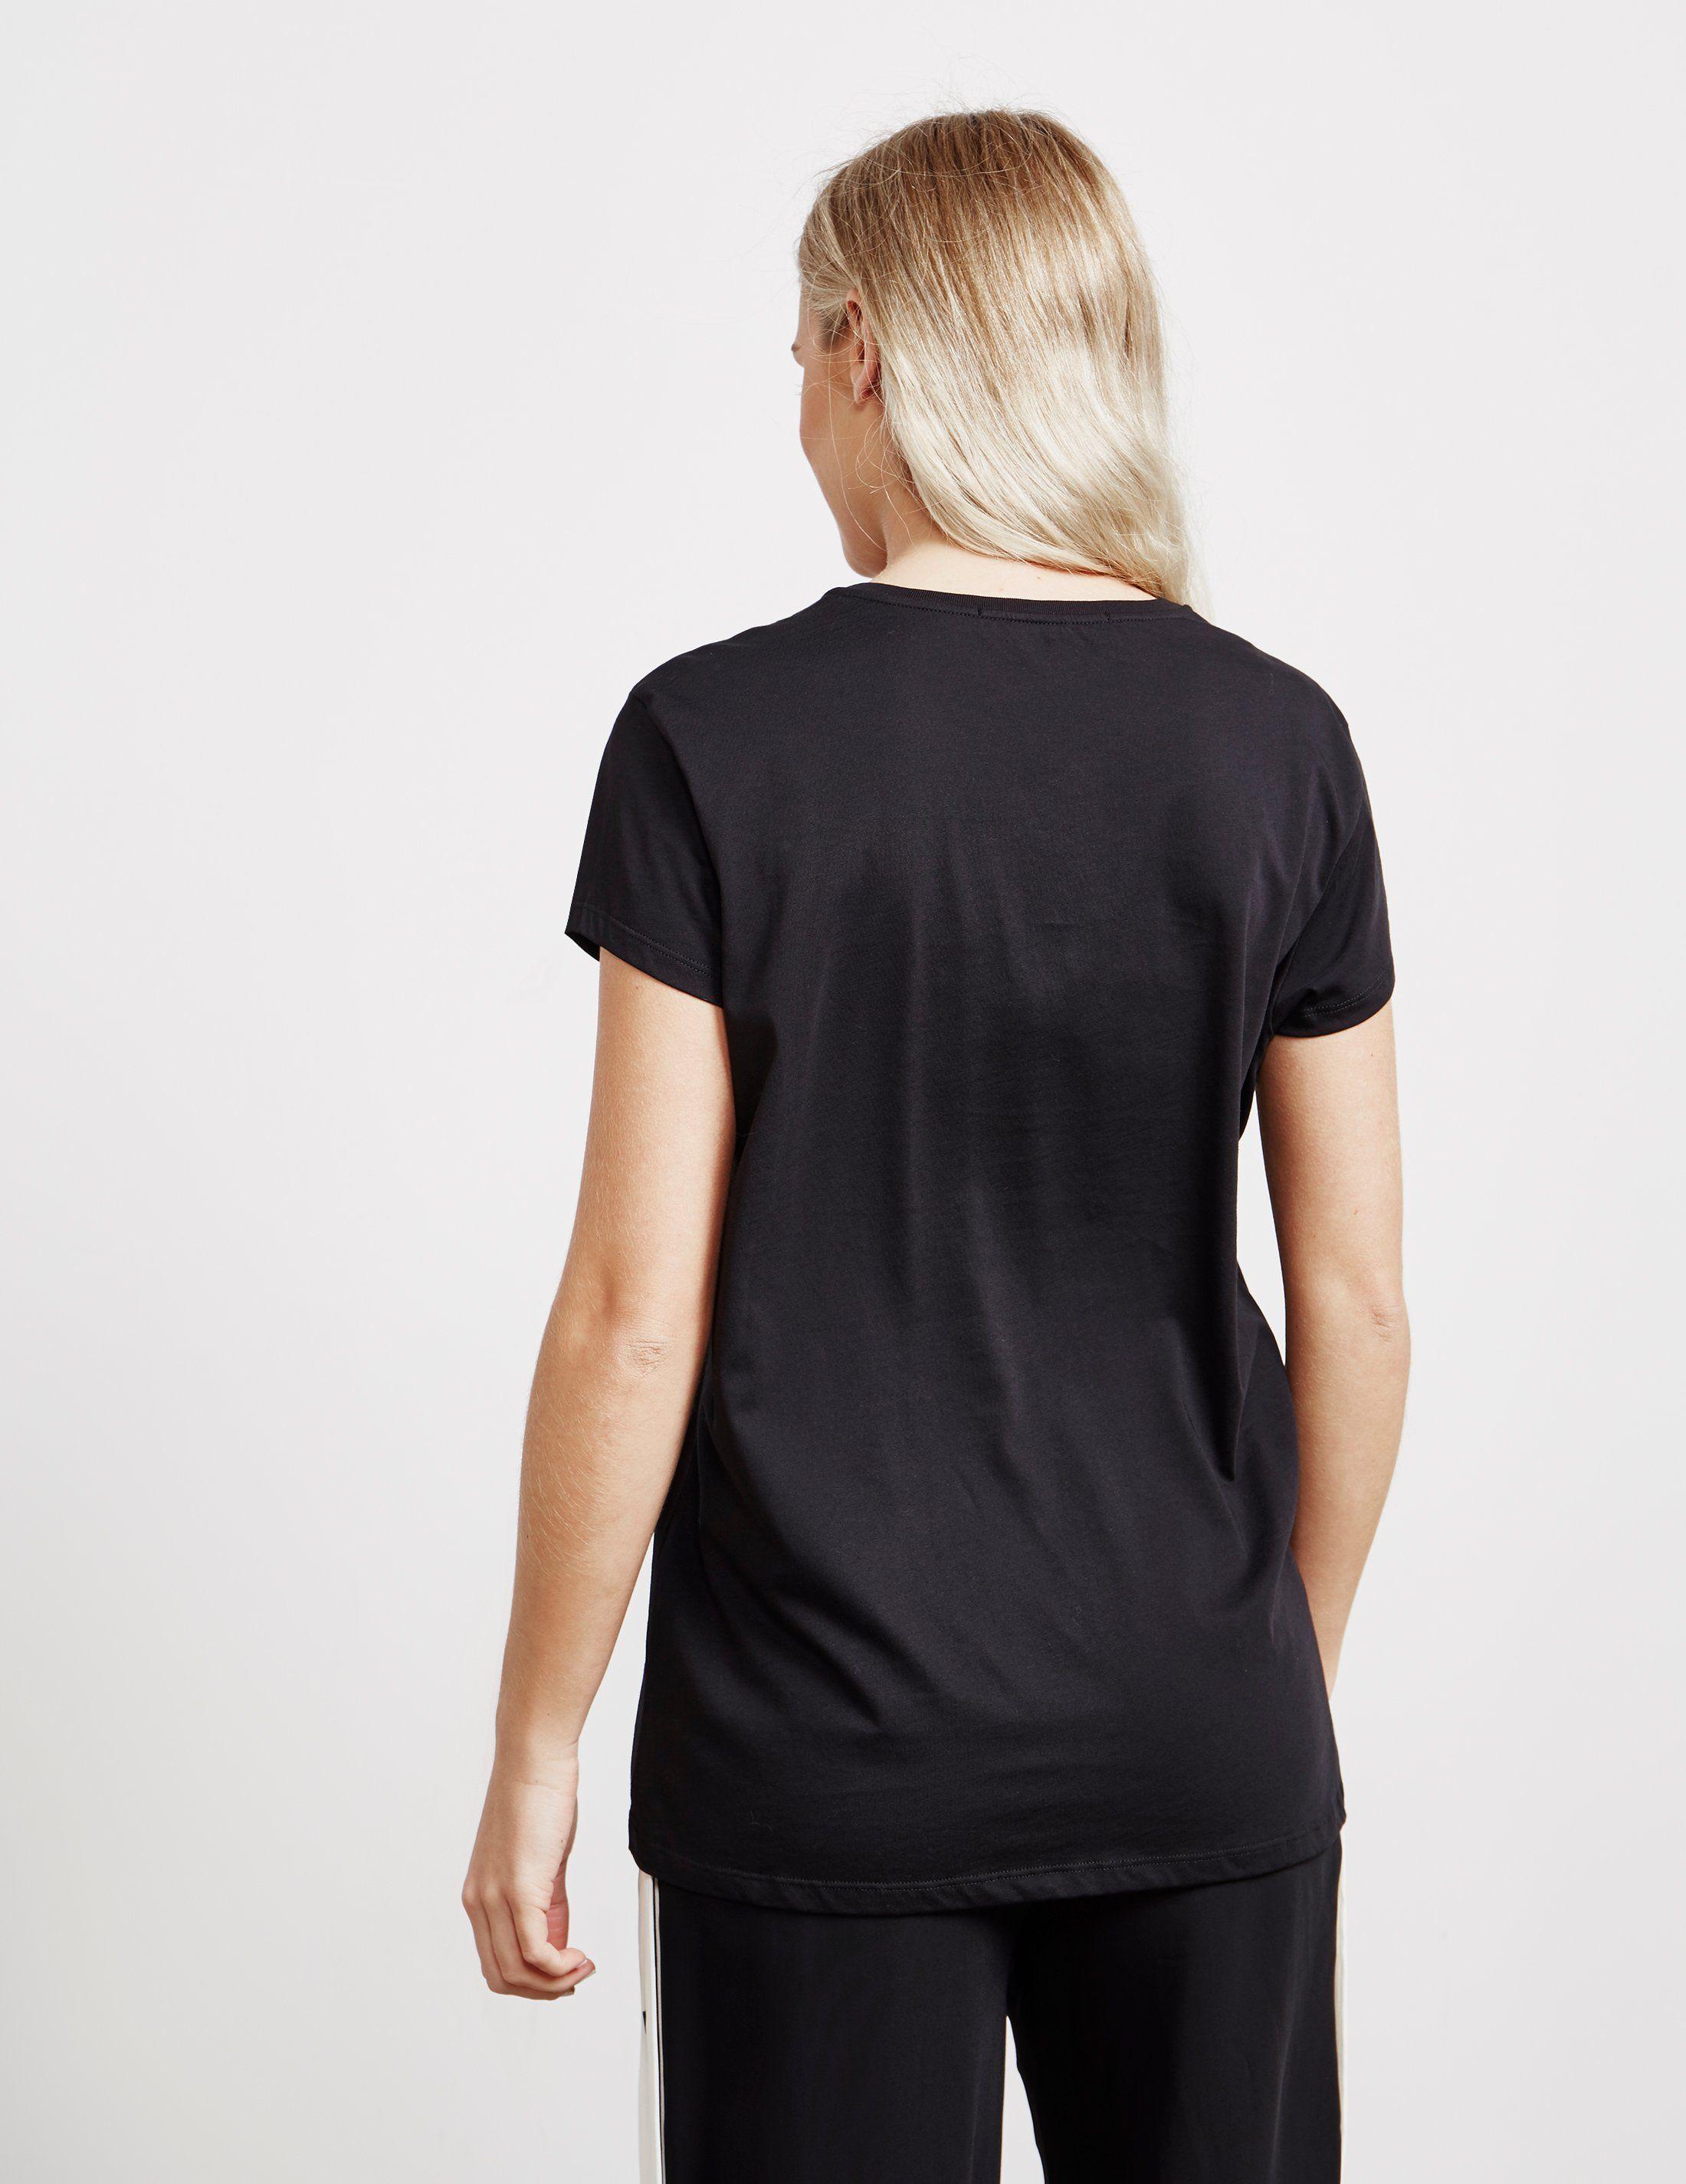 Karl Lagerfeld Address Short Sleeve T-Shirt